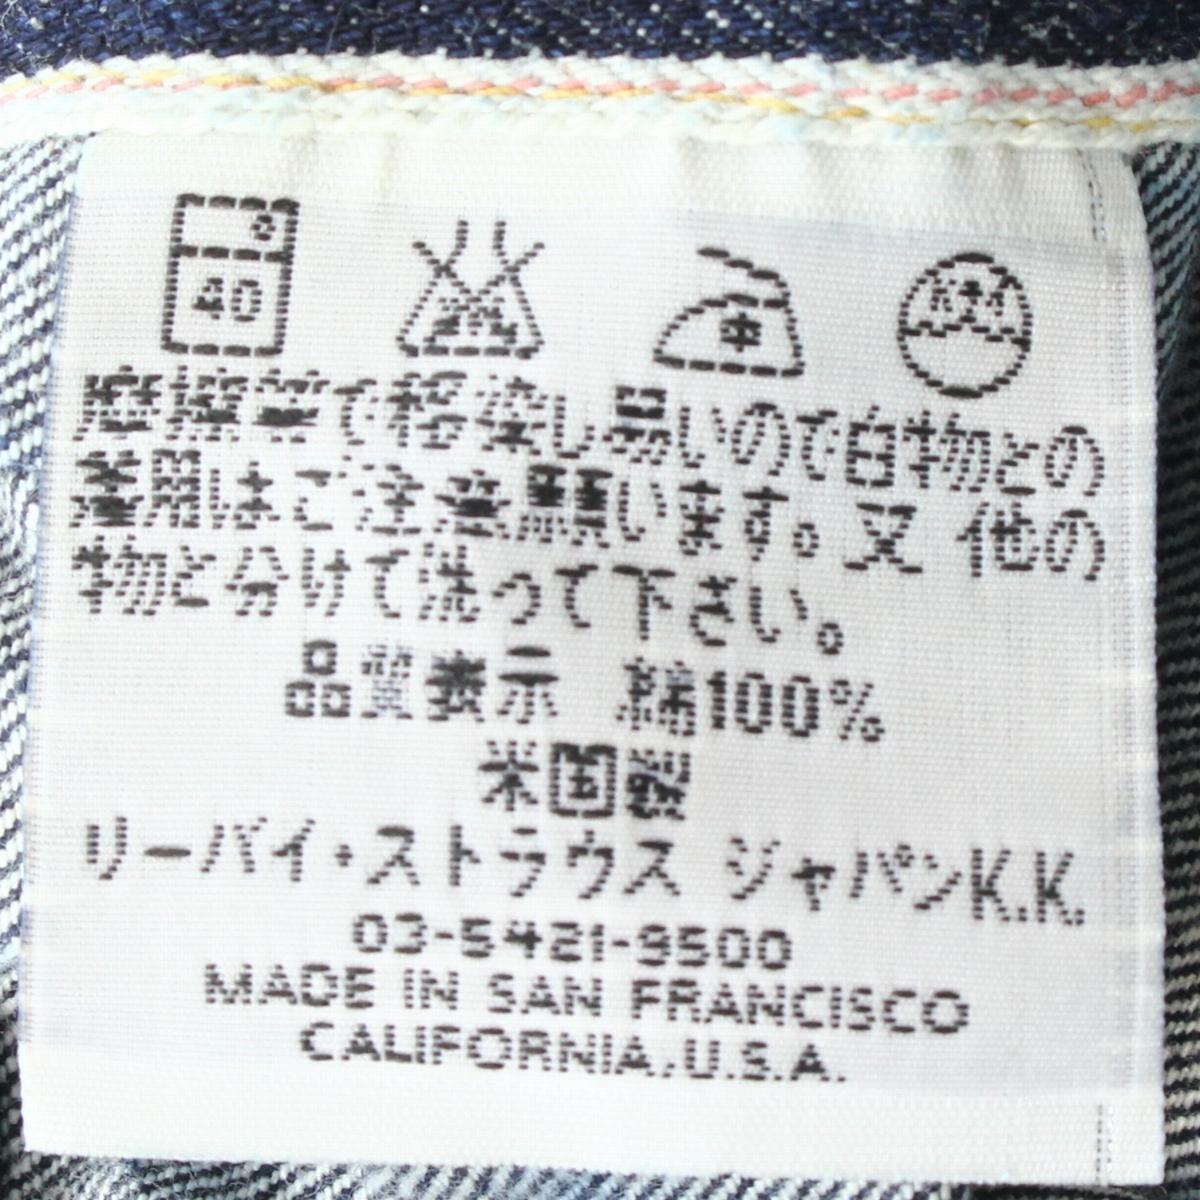 (yk99999)美品LEVI'S リーバイス507XX米国製サイズ36(セカンド デニム ジャケット70502-0003ヴィンテージ復刻バレンシア555アメリカ99年製)_画像7